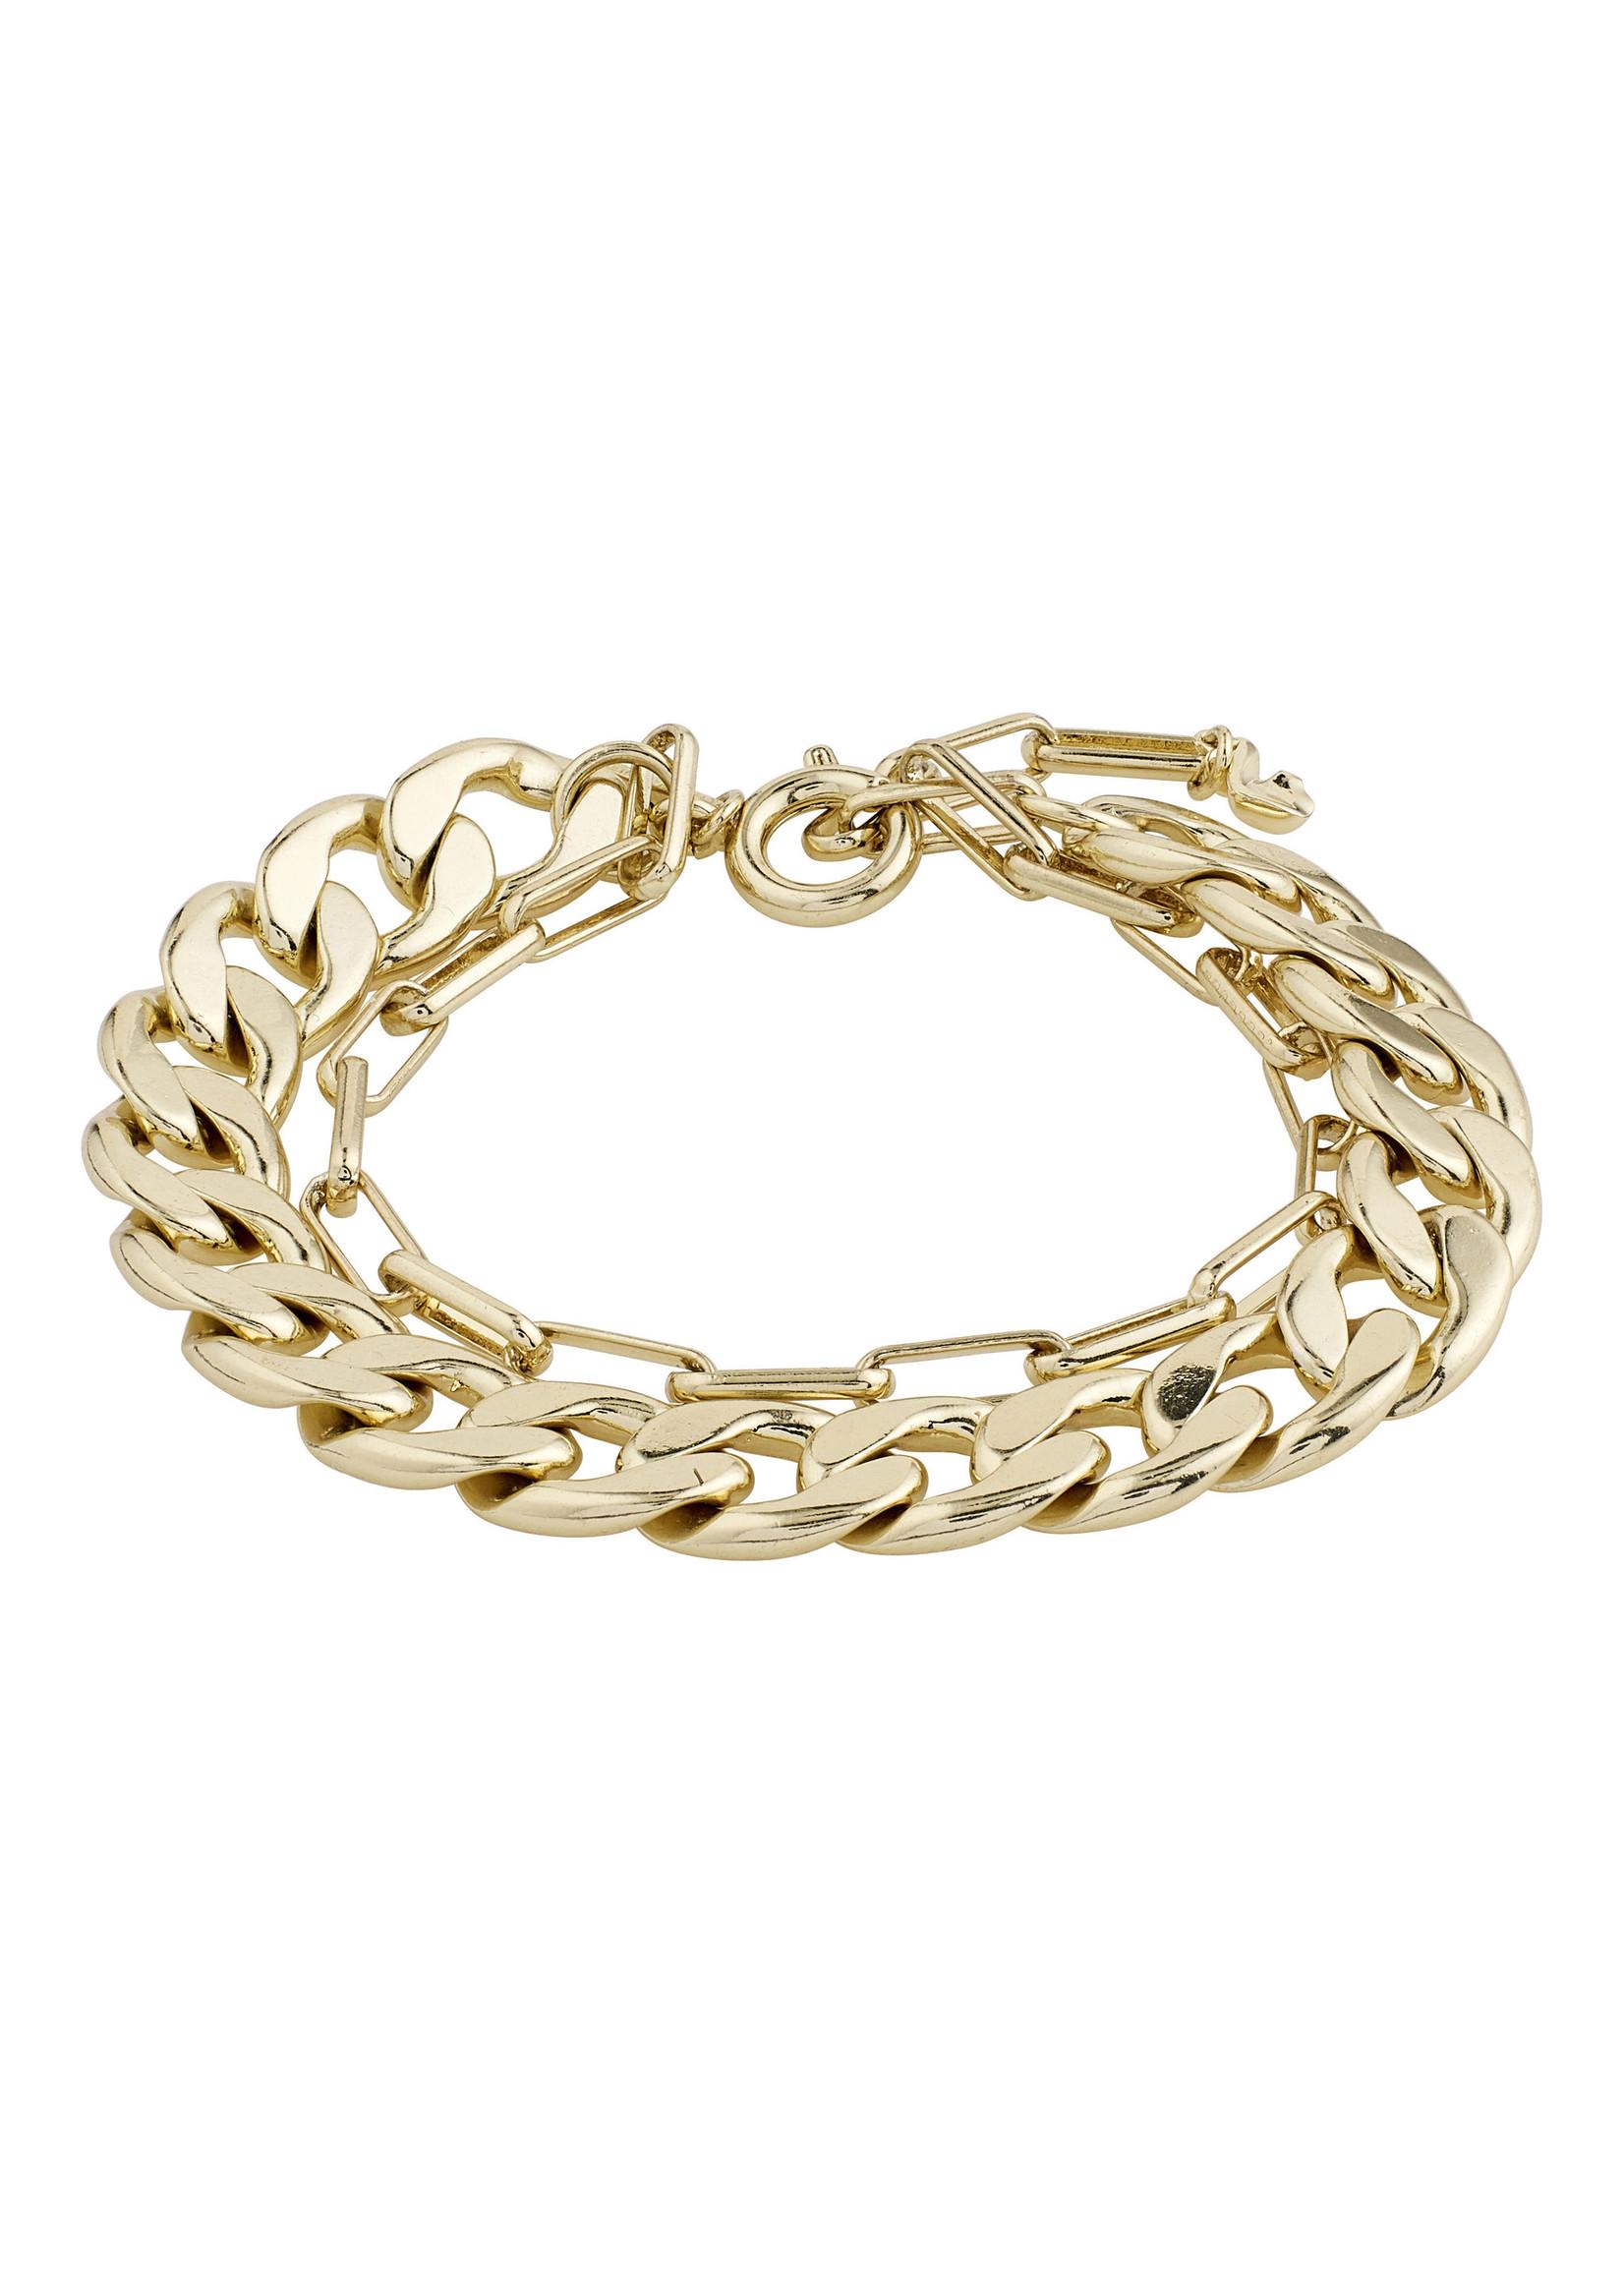 Pilgrim Jewellery Layered Compass Bracelet - Gold